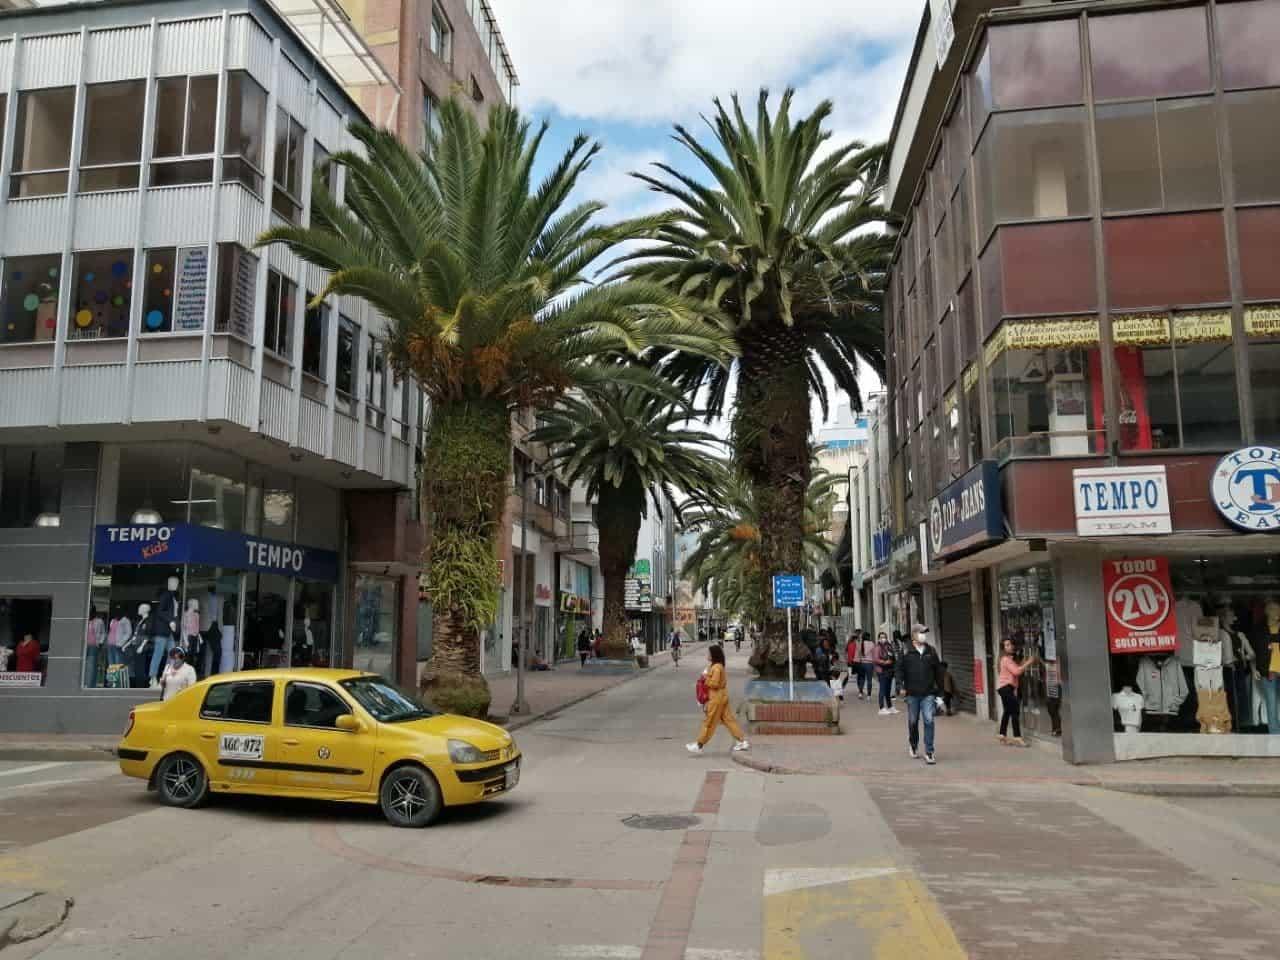 Solo taxis podrán circular durante el fin de semana en Sogamoso #Tolditos7días 1